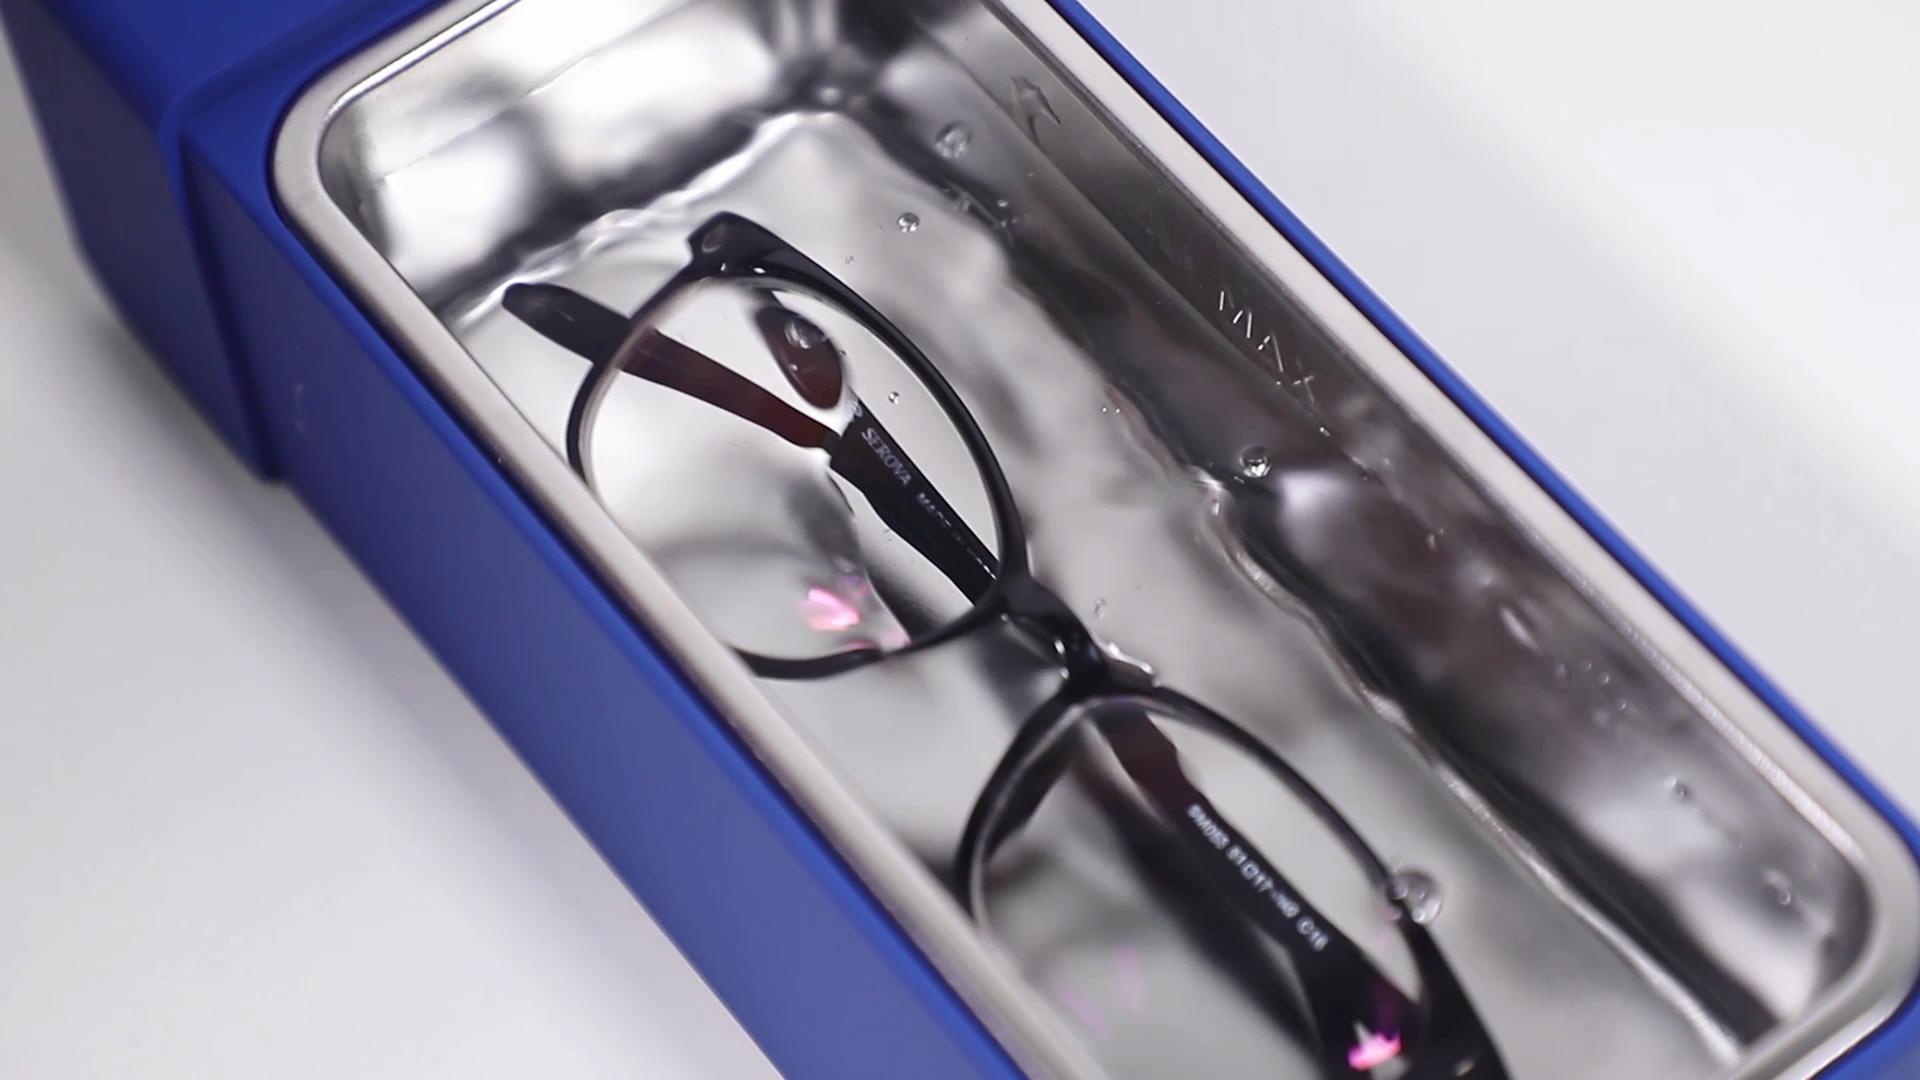 Household safety 600ml portable ultrasonic eyeglass watch jewelry cleaner machine